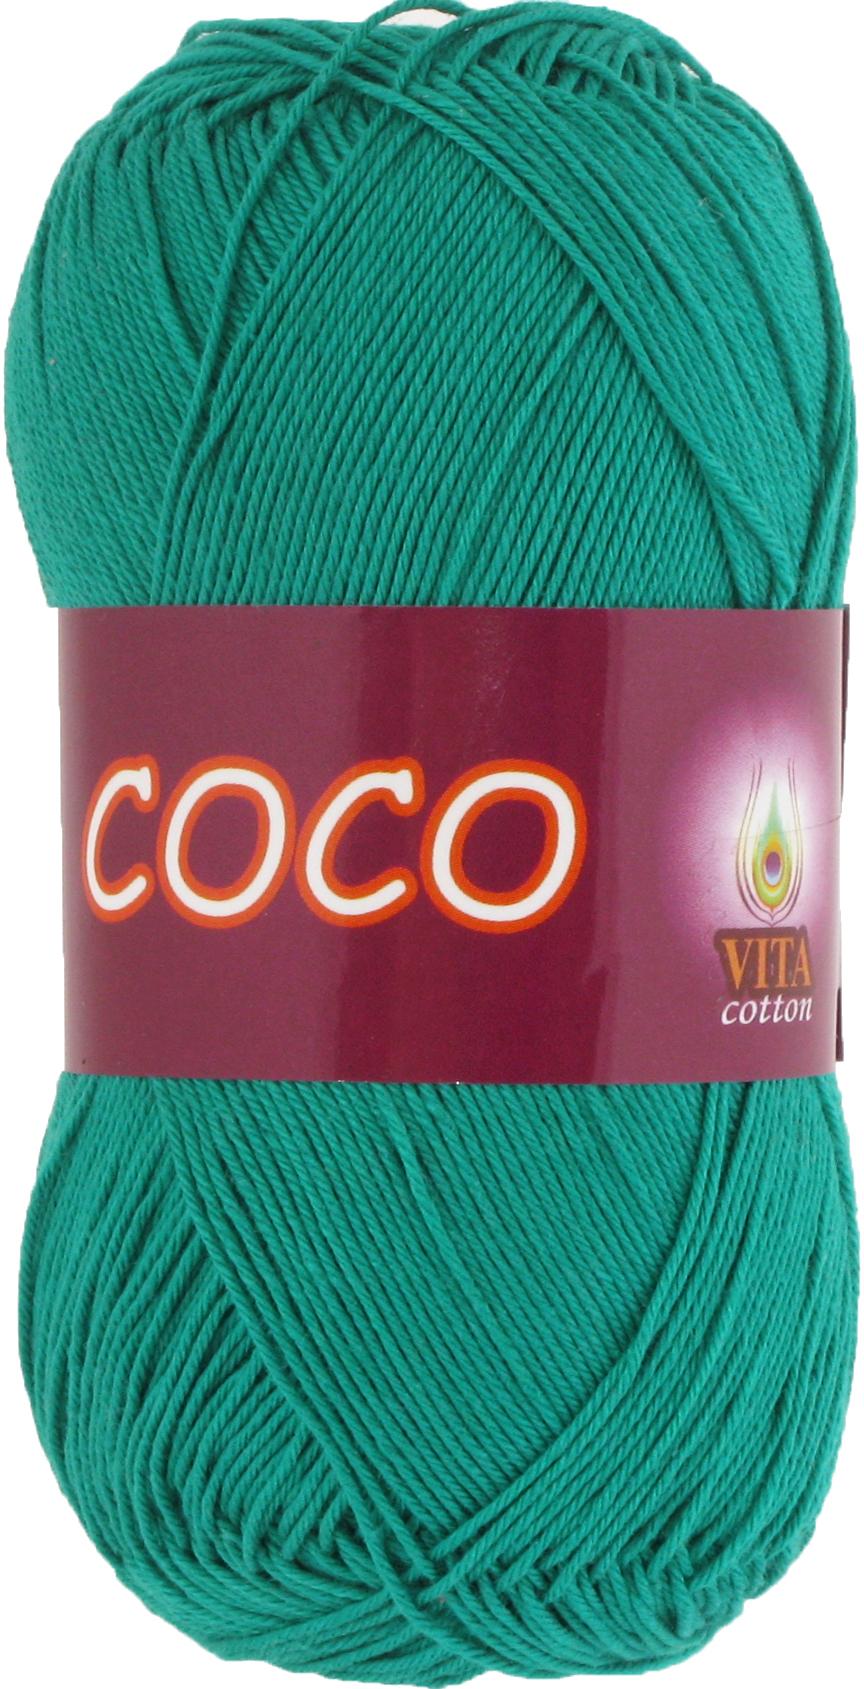 Пряжа Vita Coco зеленая бирюза 4310